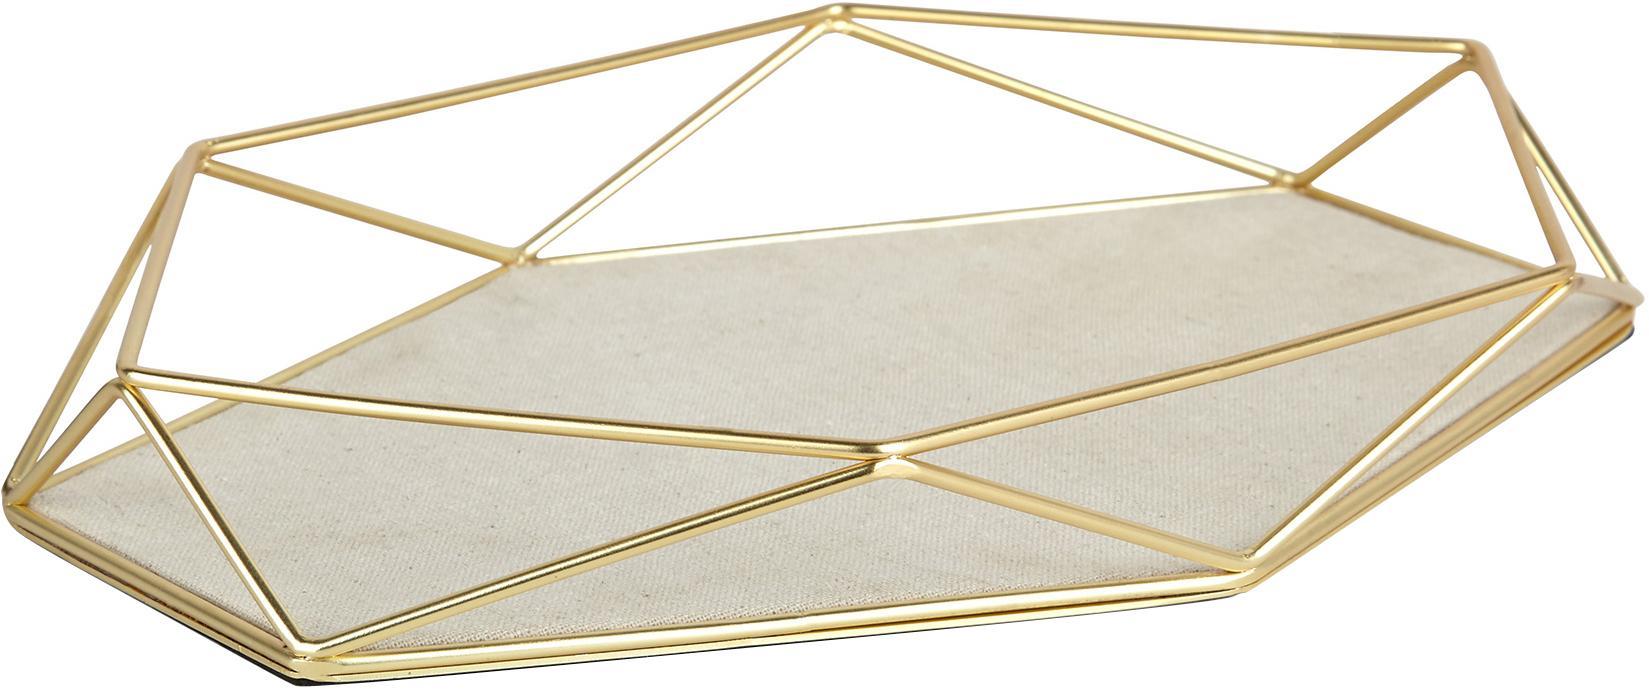 Bandeja decorativa Prisma, Estructura: acero, latón, Latón, gris pardo claro, An 28 x Al 4 cm